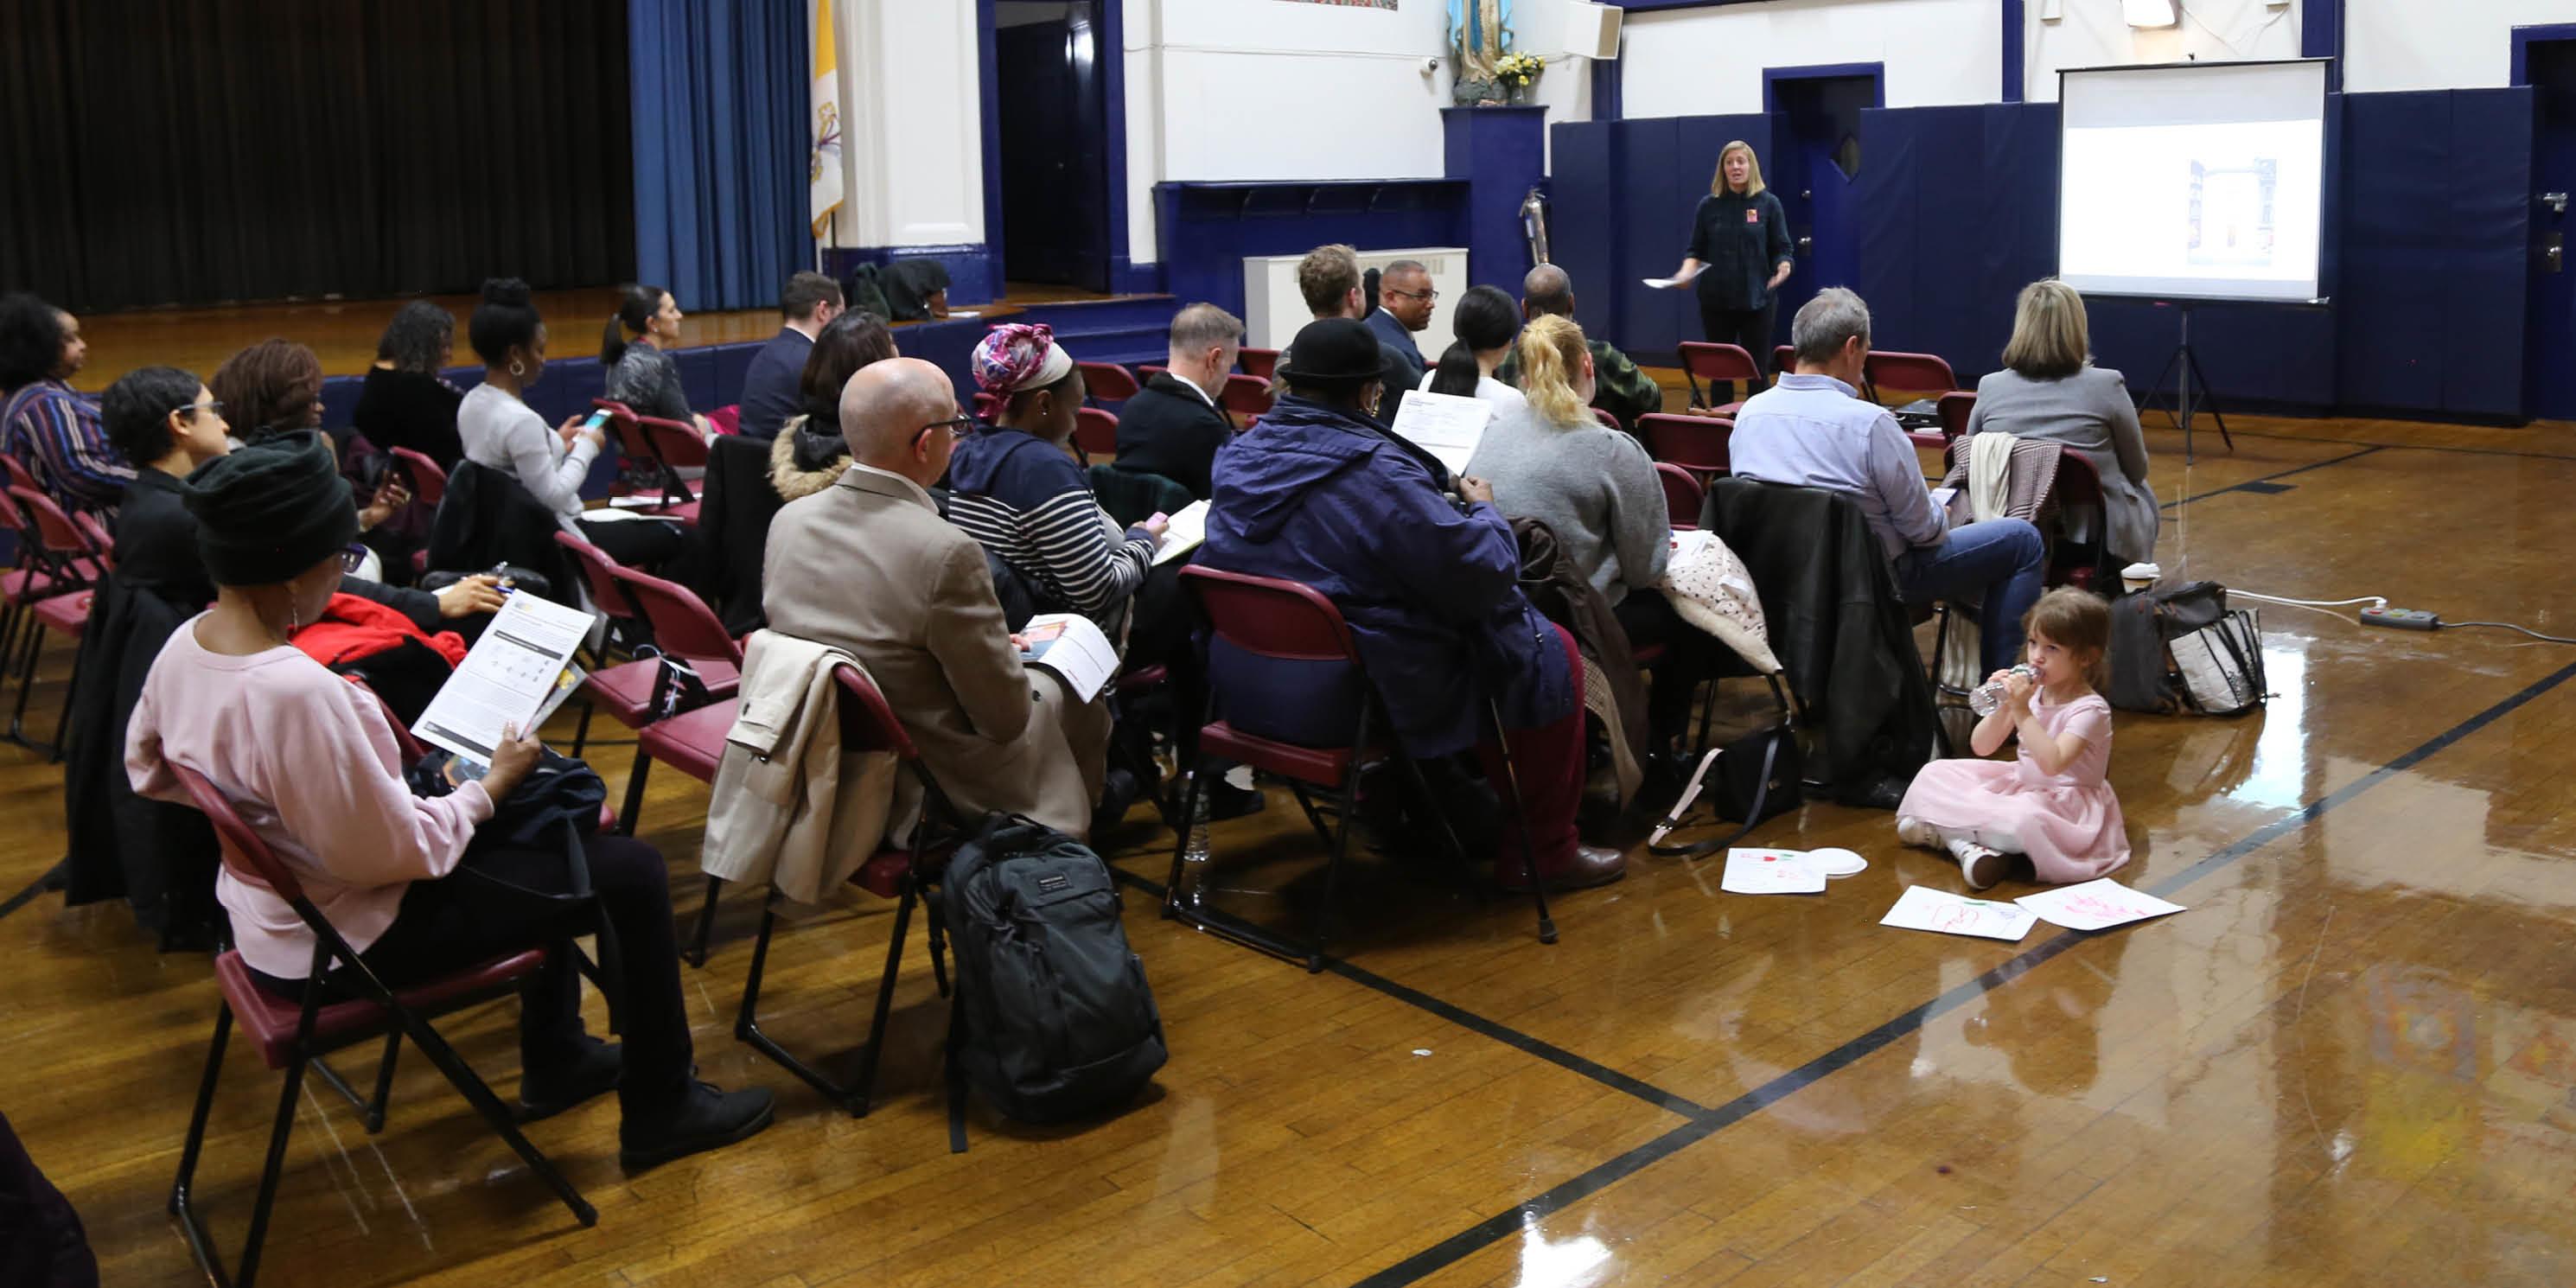 Audience members at a Livable Neighborhoods Program workshop in West Harlem.